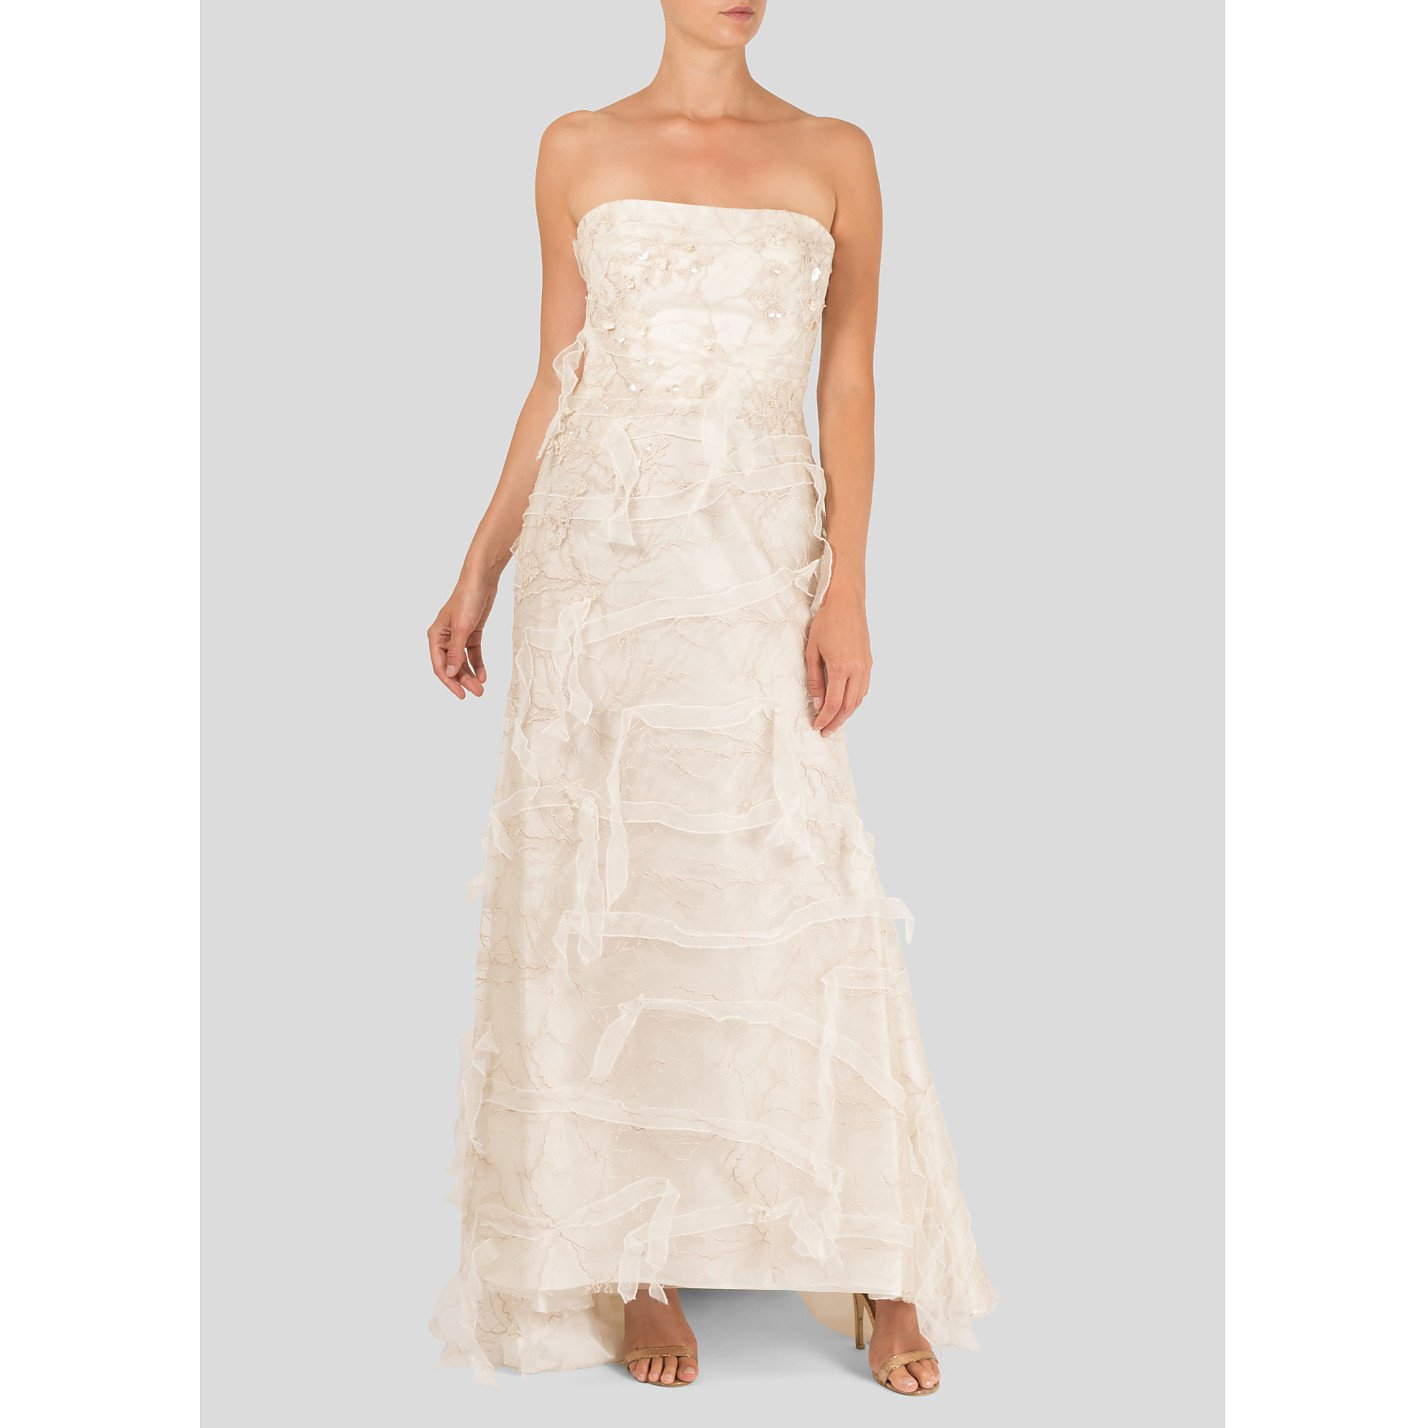 Cymbeline Strapless Bridal Dress